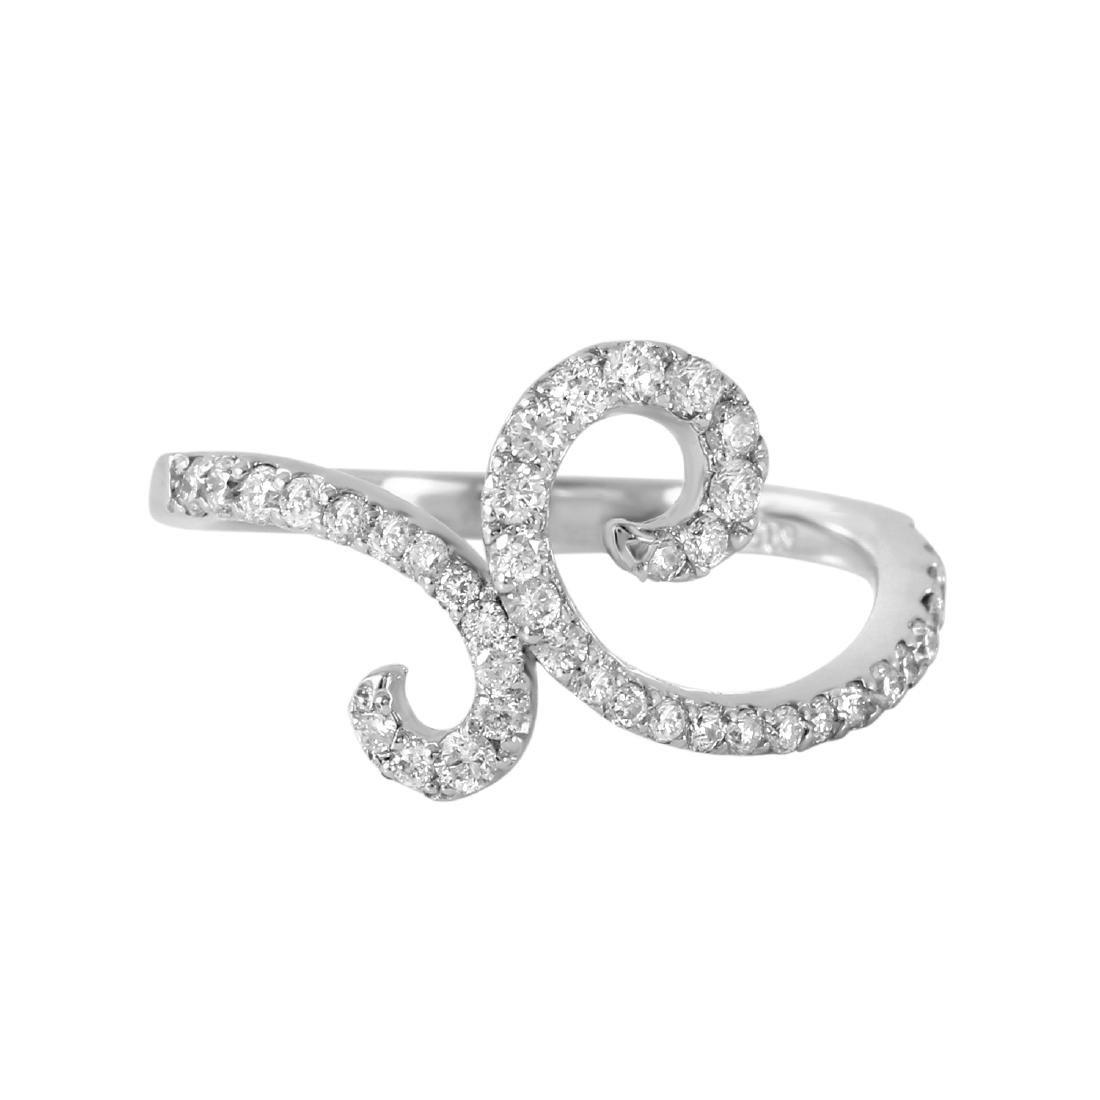 0.54 Carat Natural Diamond 18K Solid White Gold Ring - 2